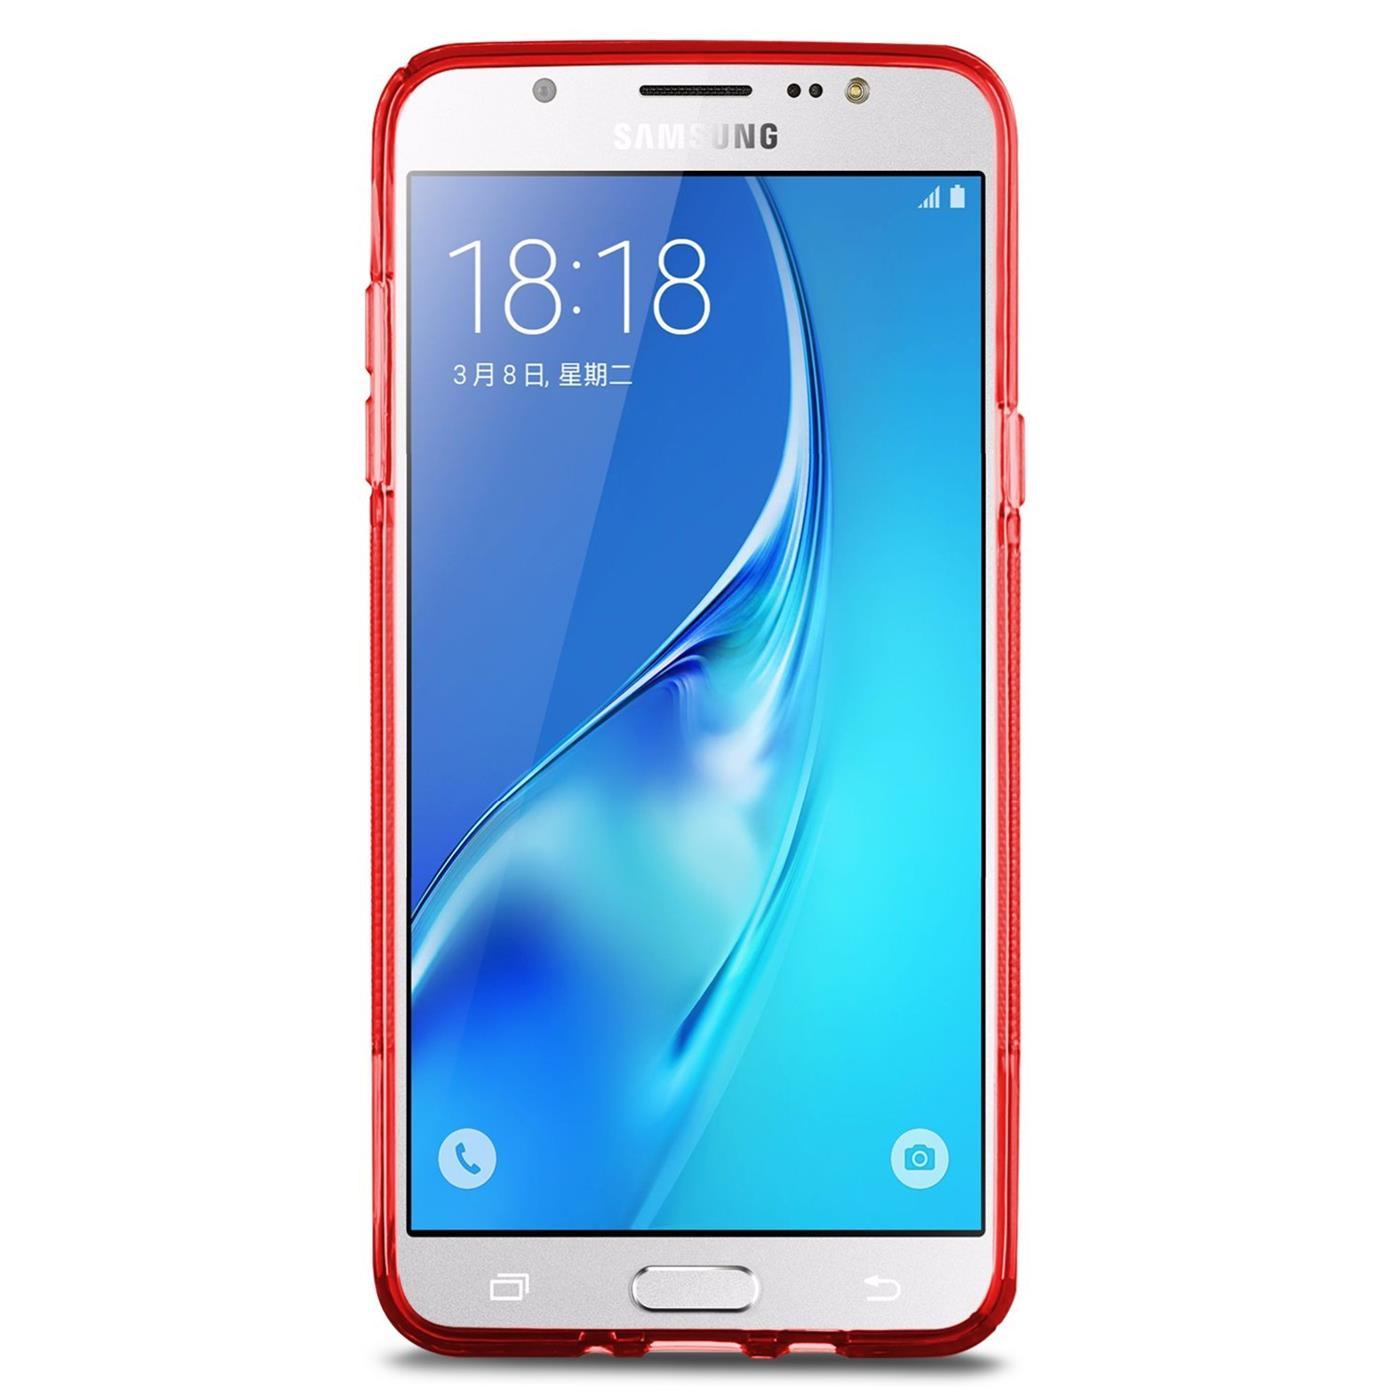 Samsung-Galaxy-j7-2016-Silikon-Gel-S-Line-Case-Cover-Duenn-Slim-Back-Bumper Indexbild 16